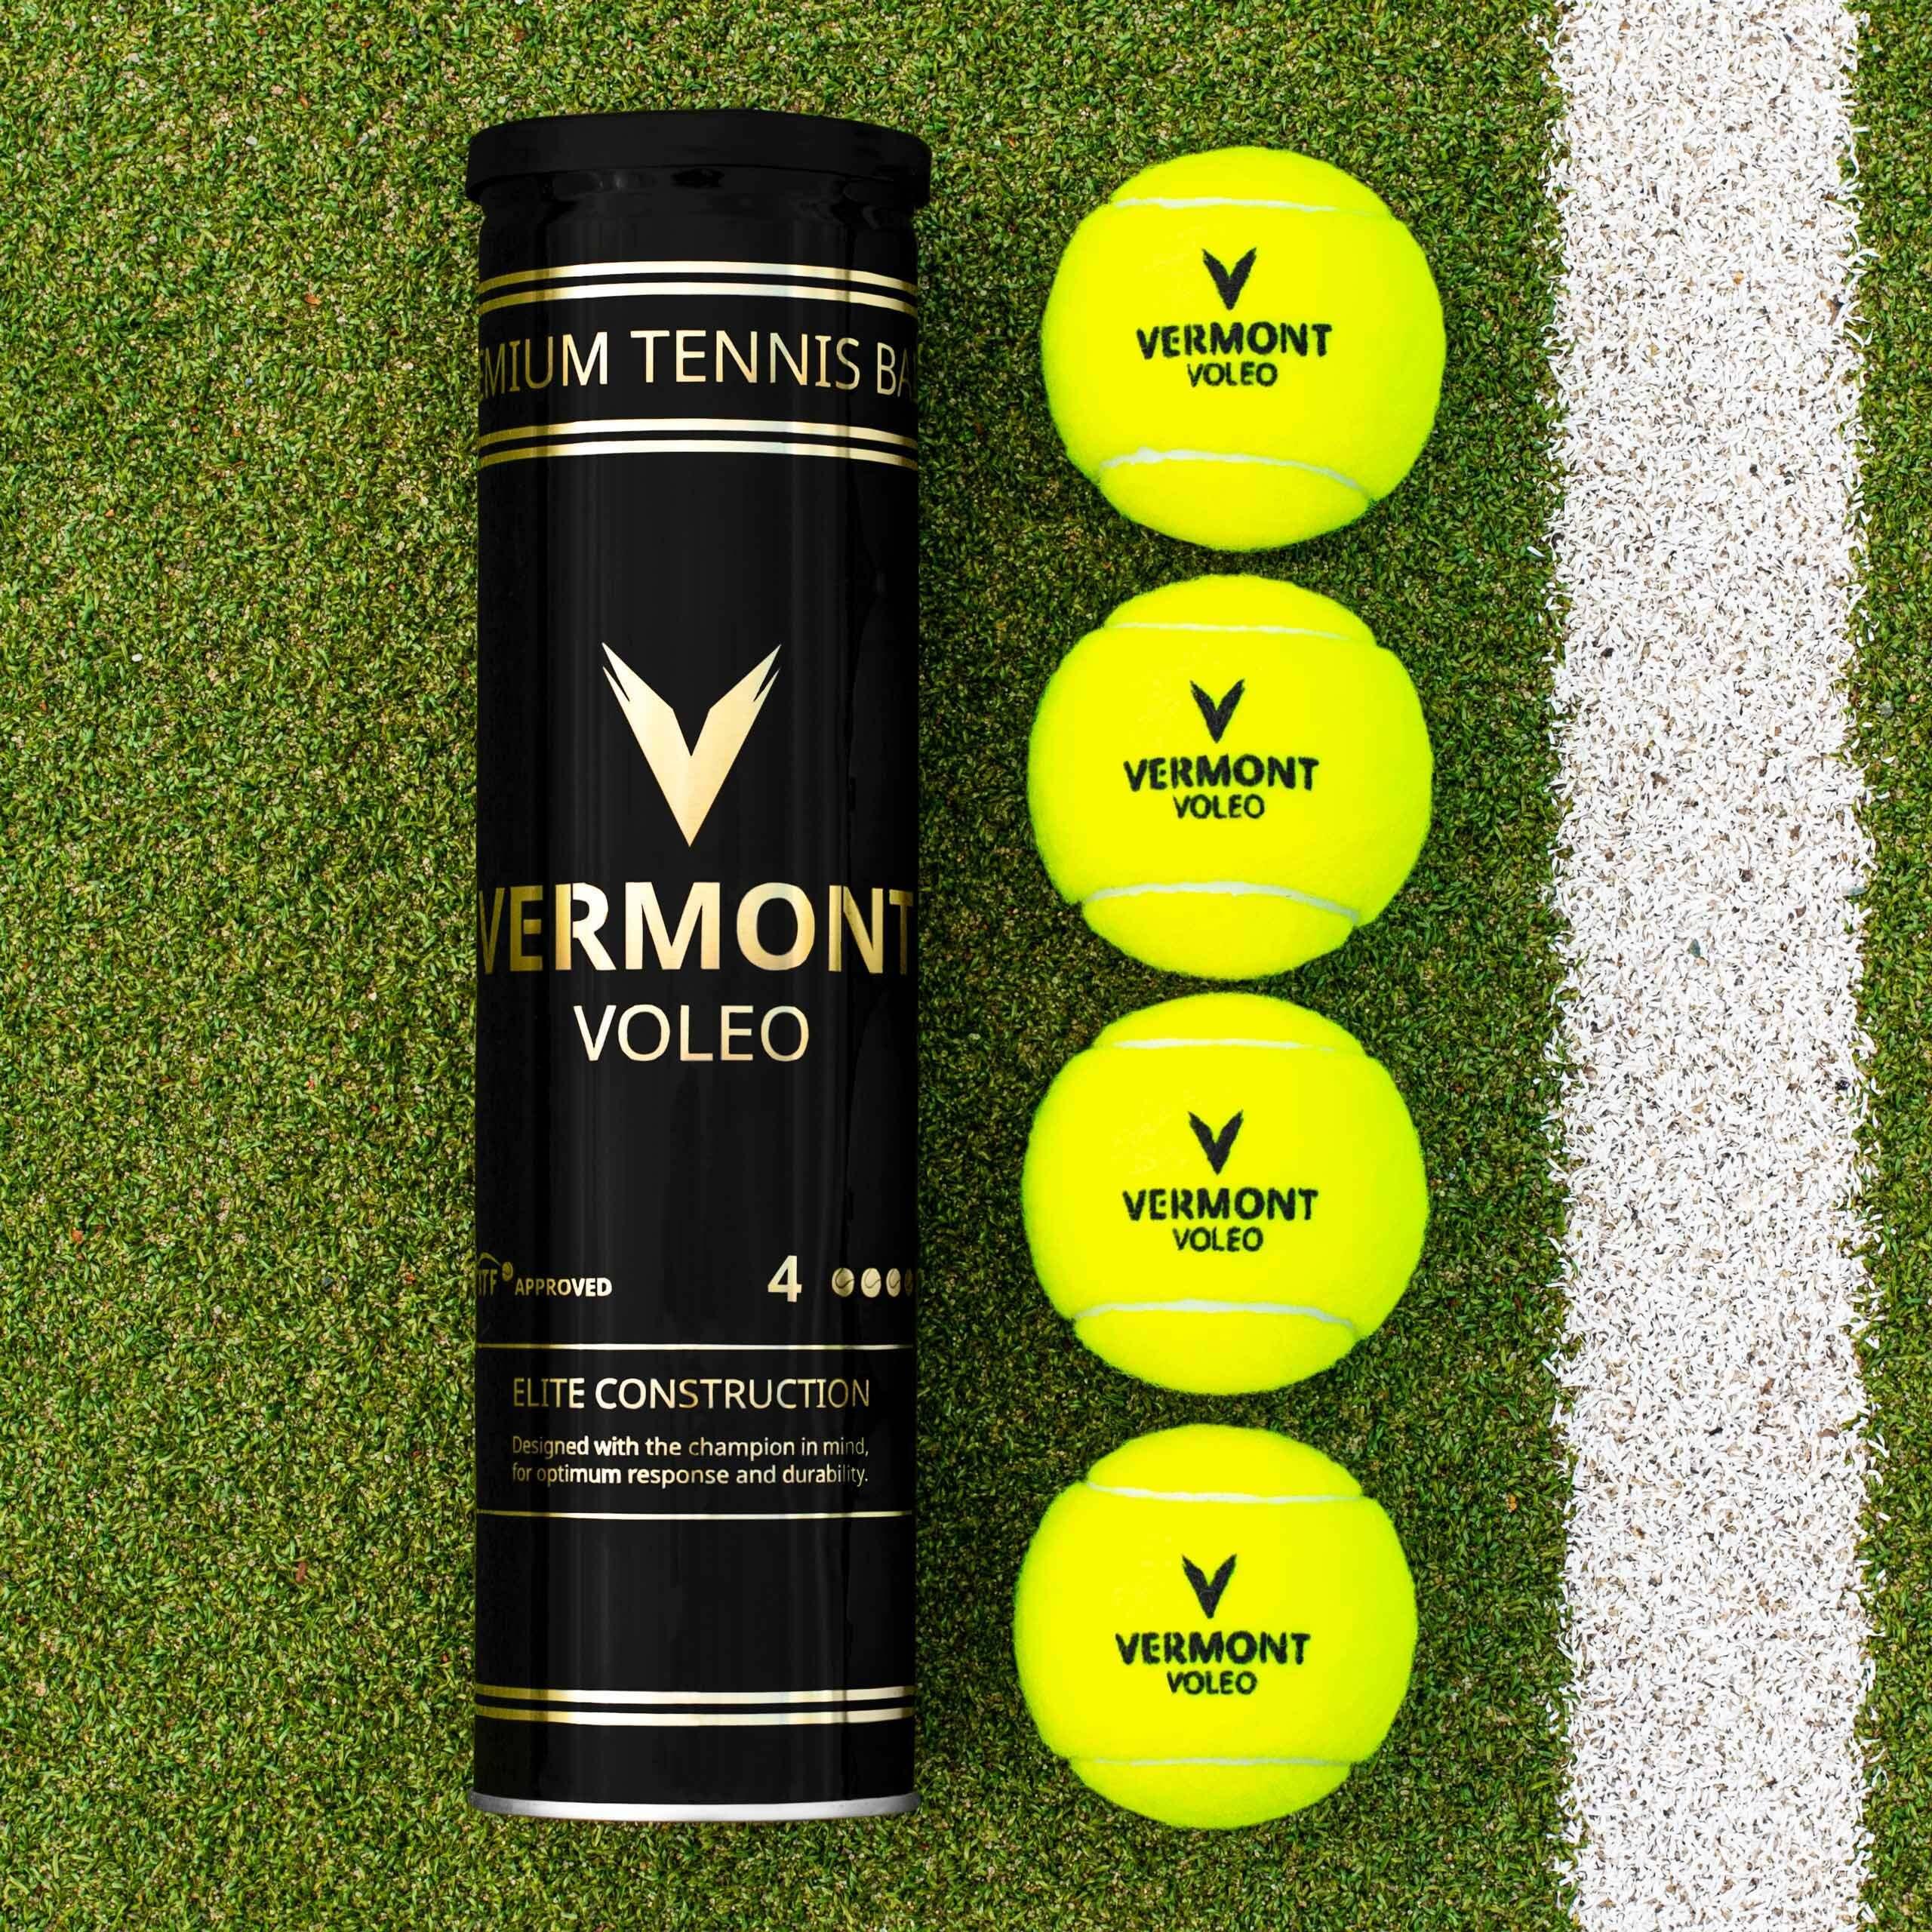 Vermont Voleo Tennis Balls [4 Ball Tubes]